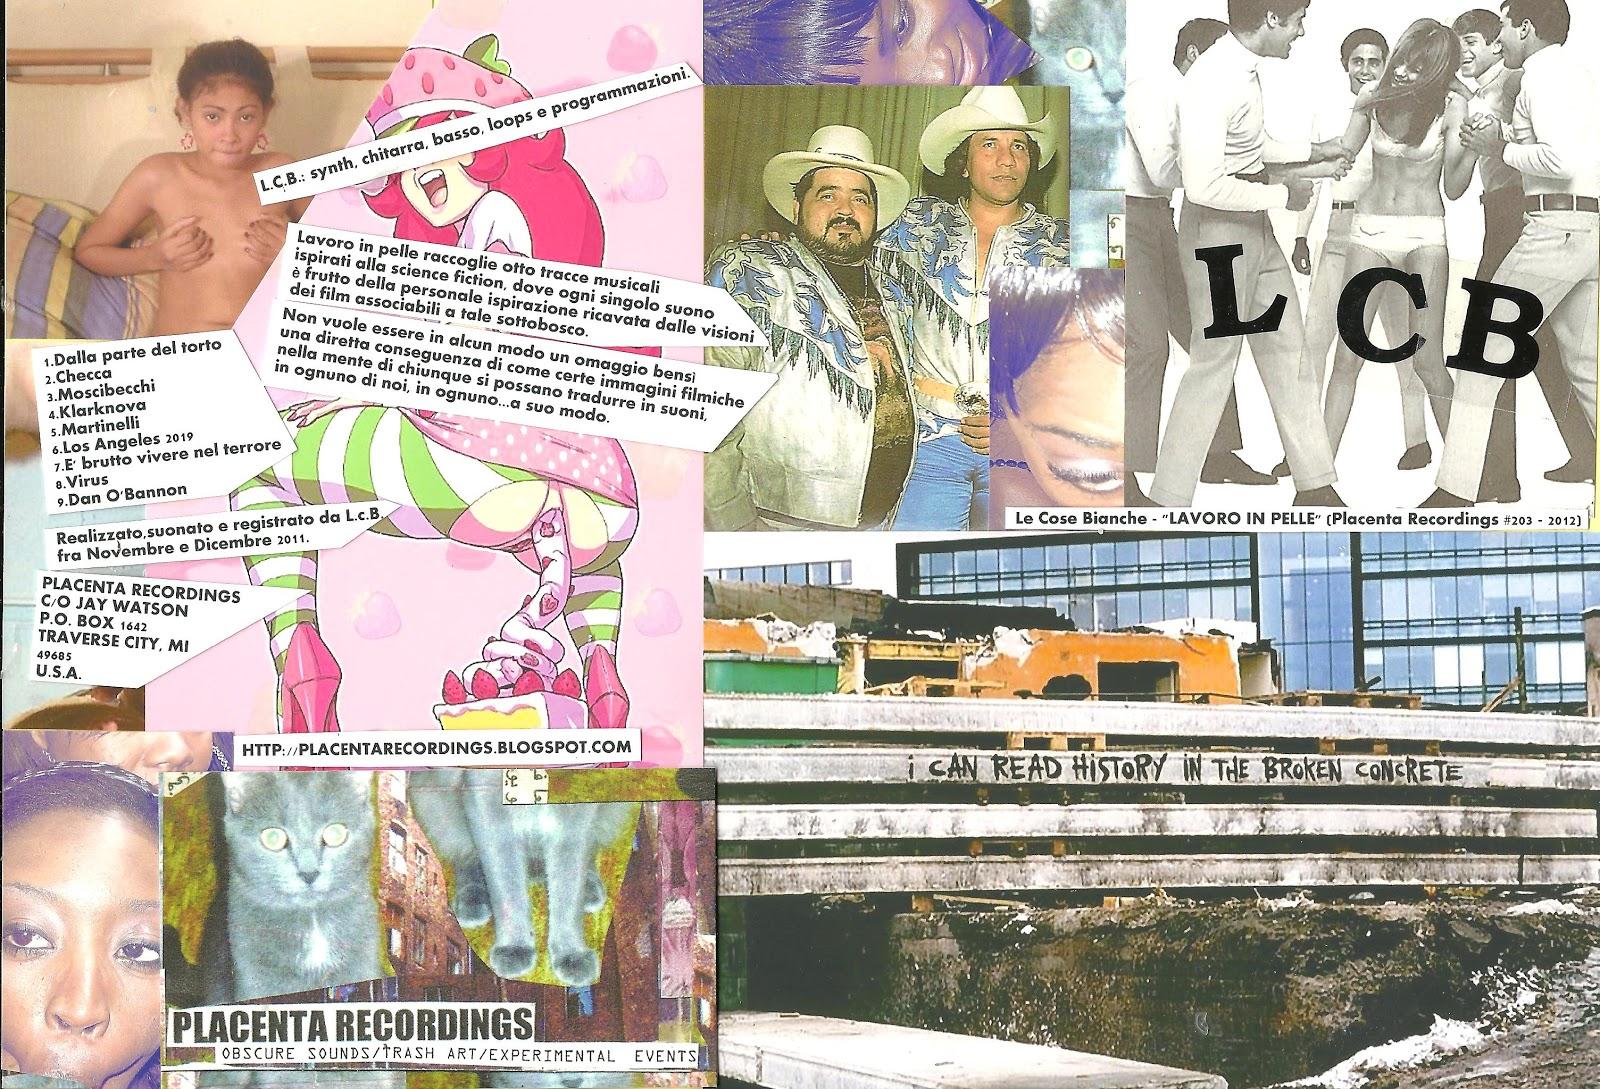 Placenta Recordings September 2012